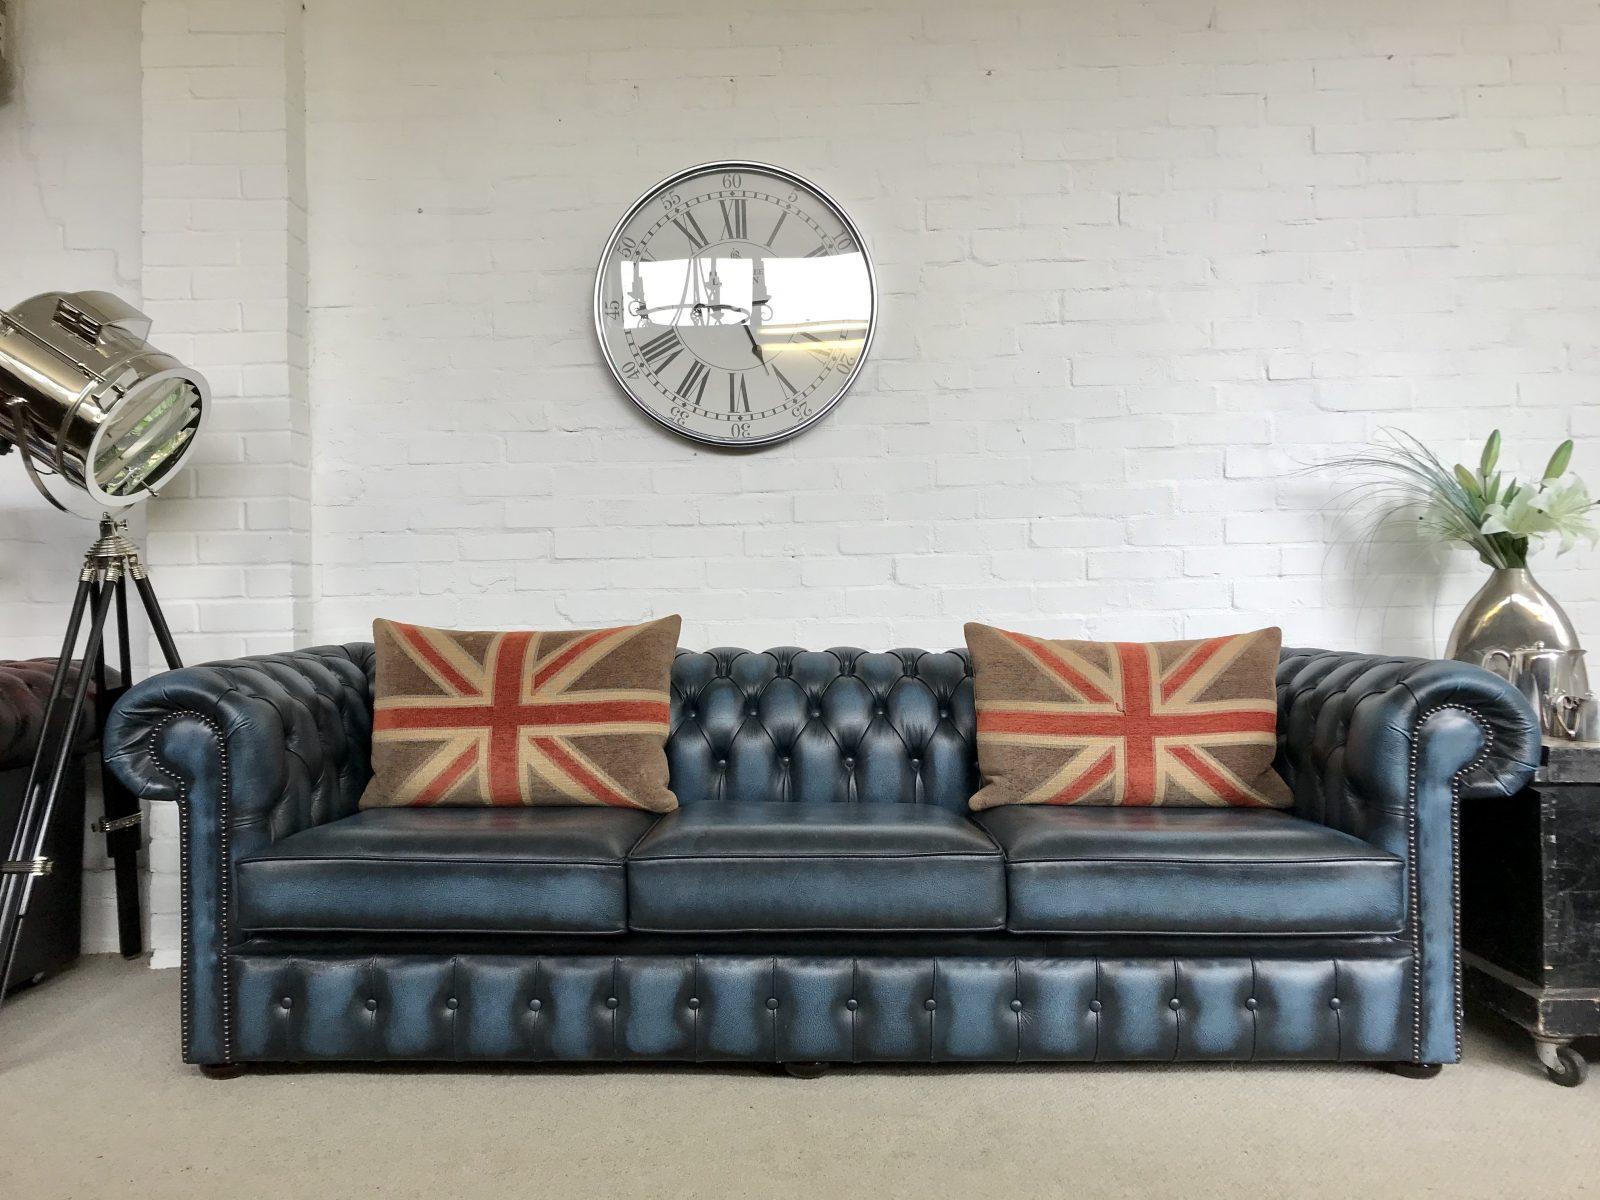 Stunning Sapphire Blue 4 Seater Chesterfield Sofa.